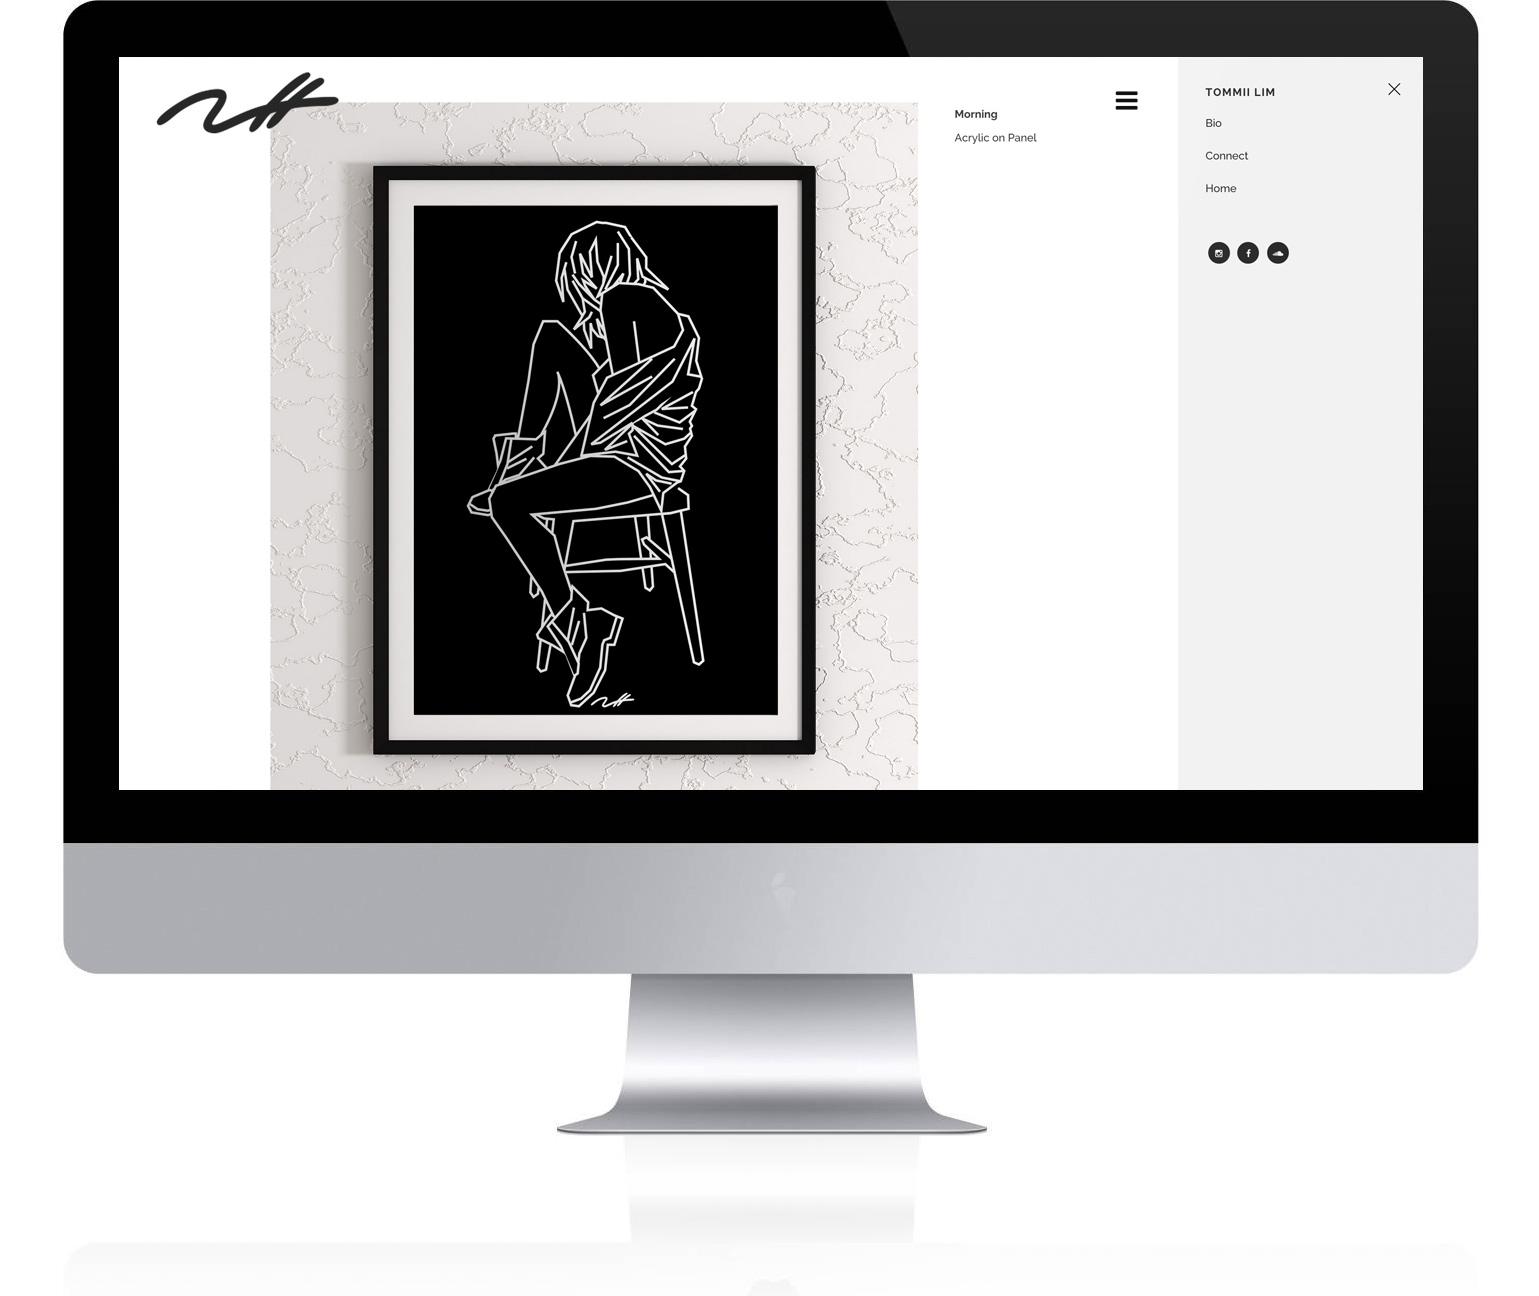 Uglyfresh-Mac-Screen-05.jpg